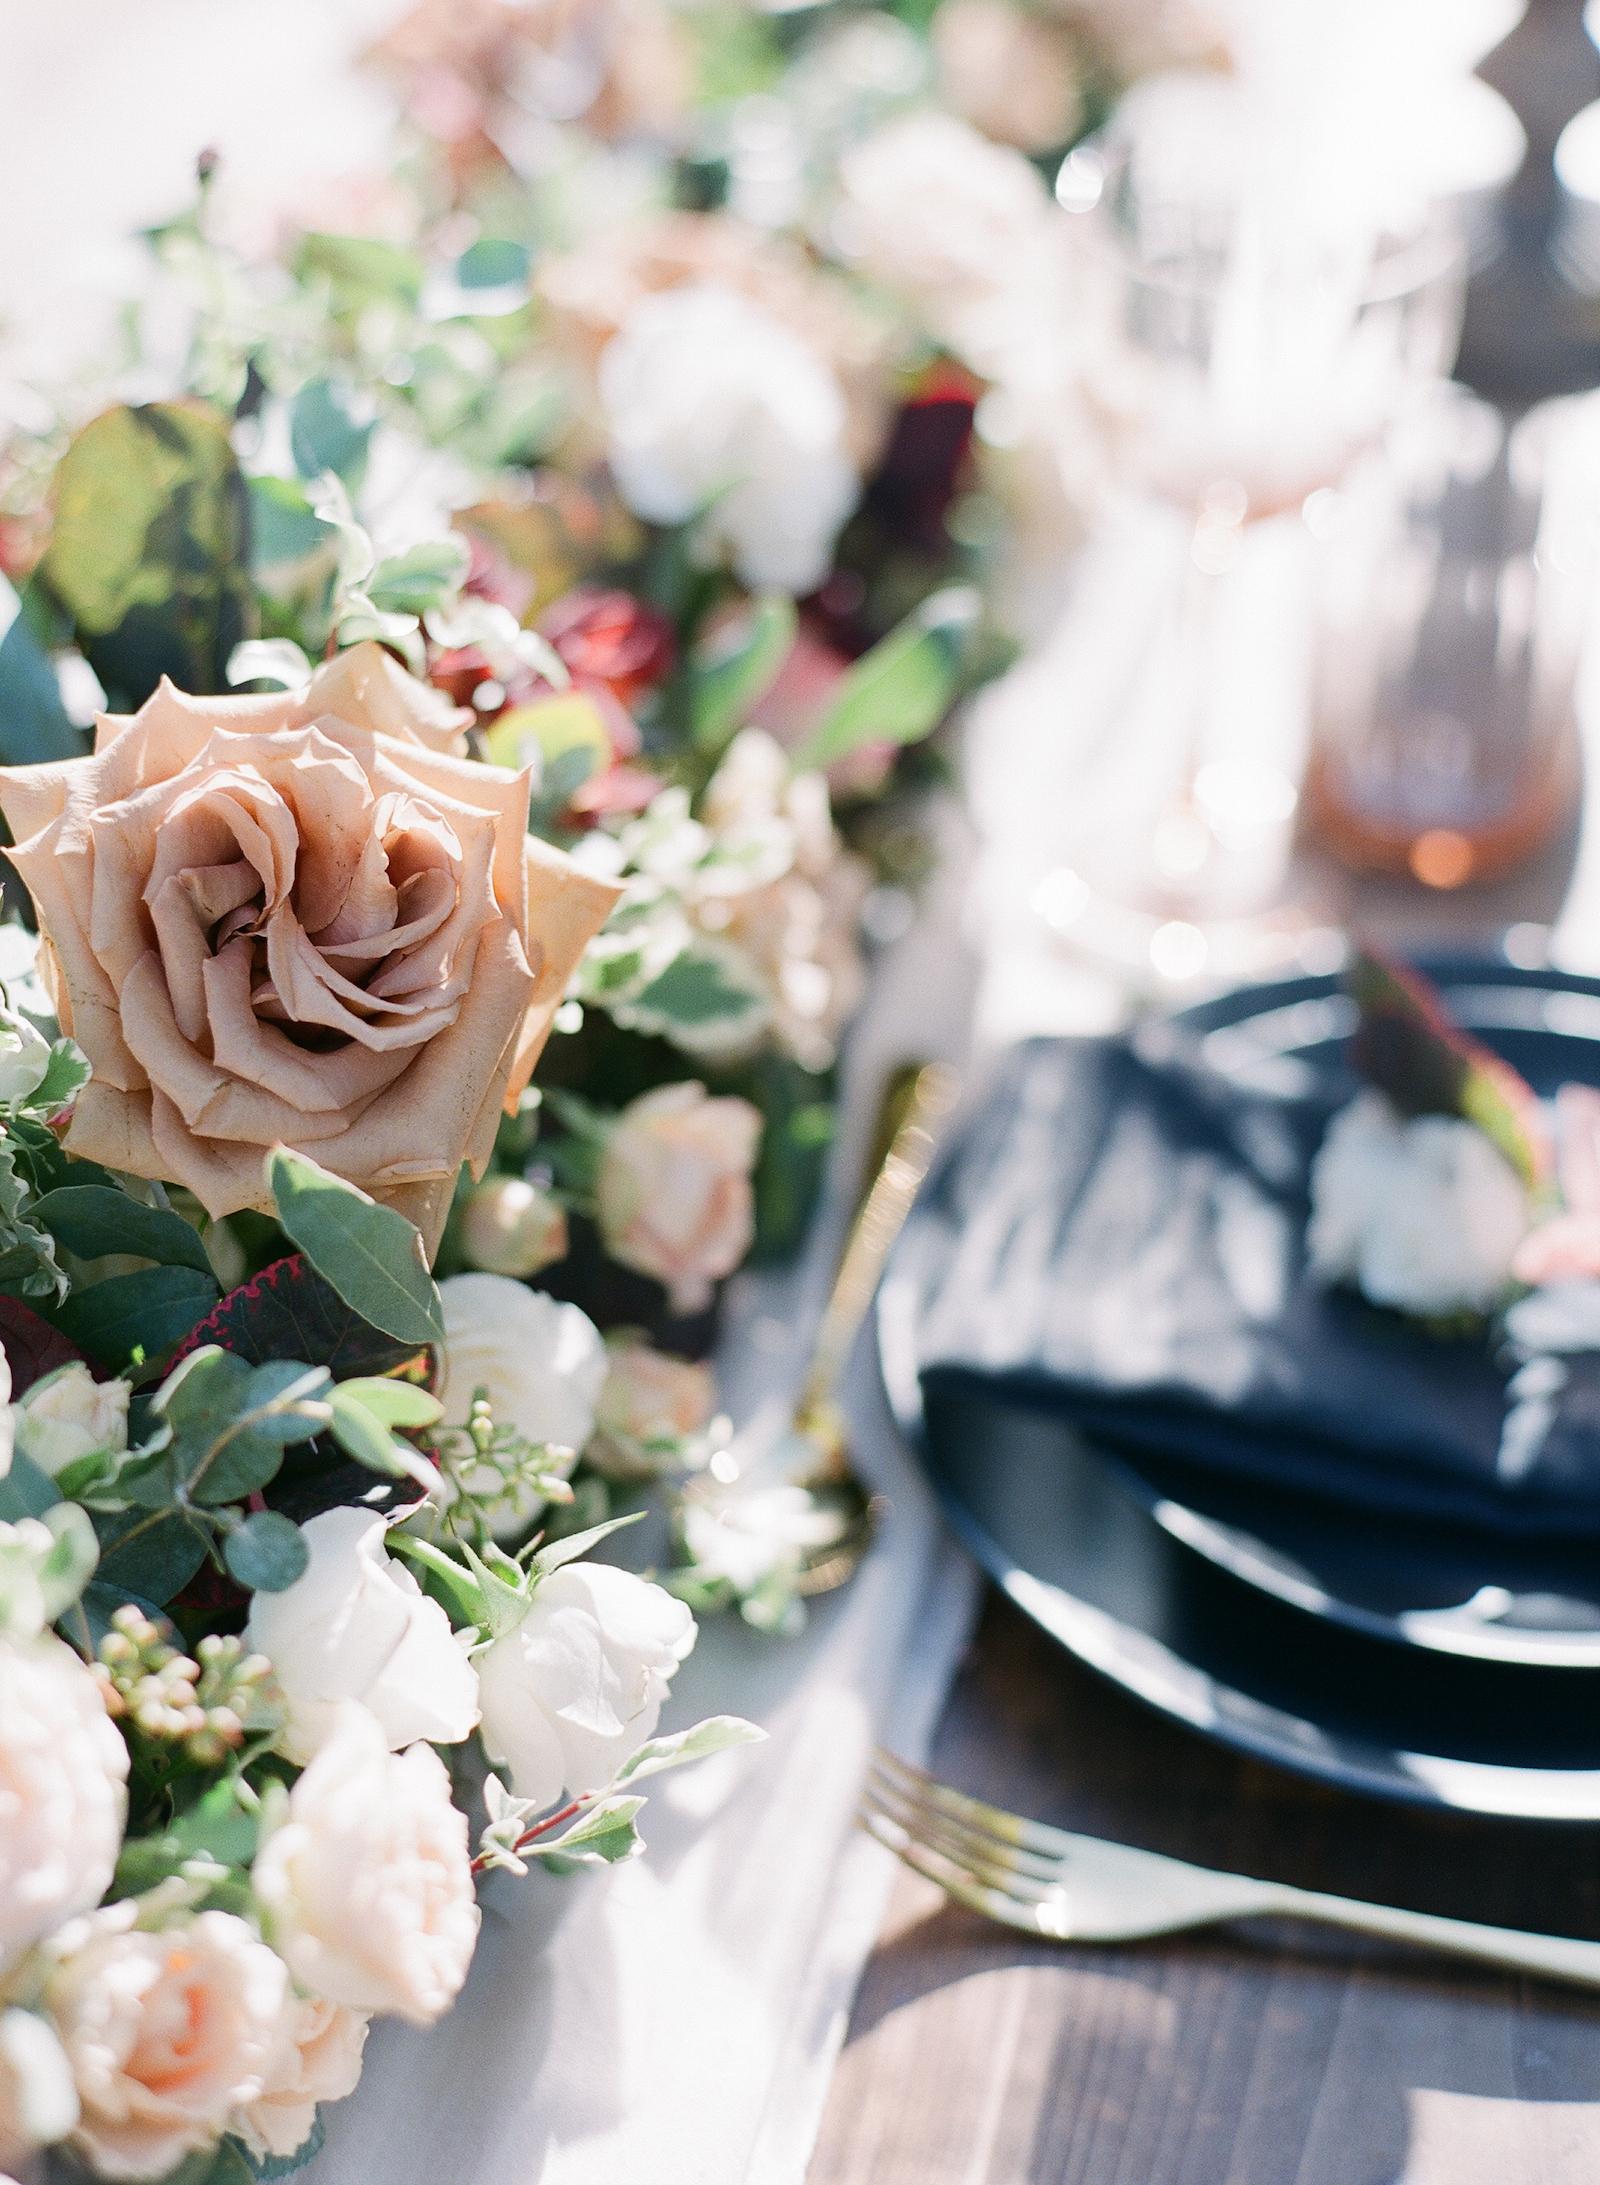 Luxury Wedding Planner UK, London & Europe | A Feminine & Refined Autumn Wedding Inspiration | English Manor Country Autumn Wedding Moody Romantic Warm Velvet Black Red and Peach Tones | Molly Carr Photography106.JPG